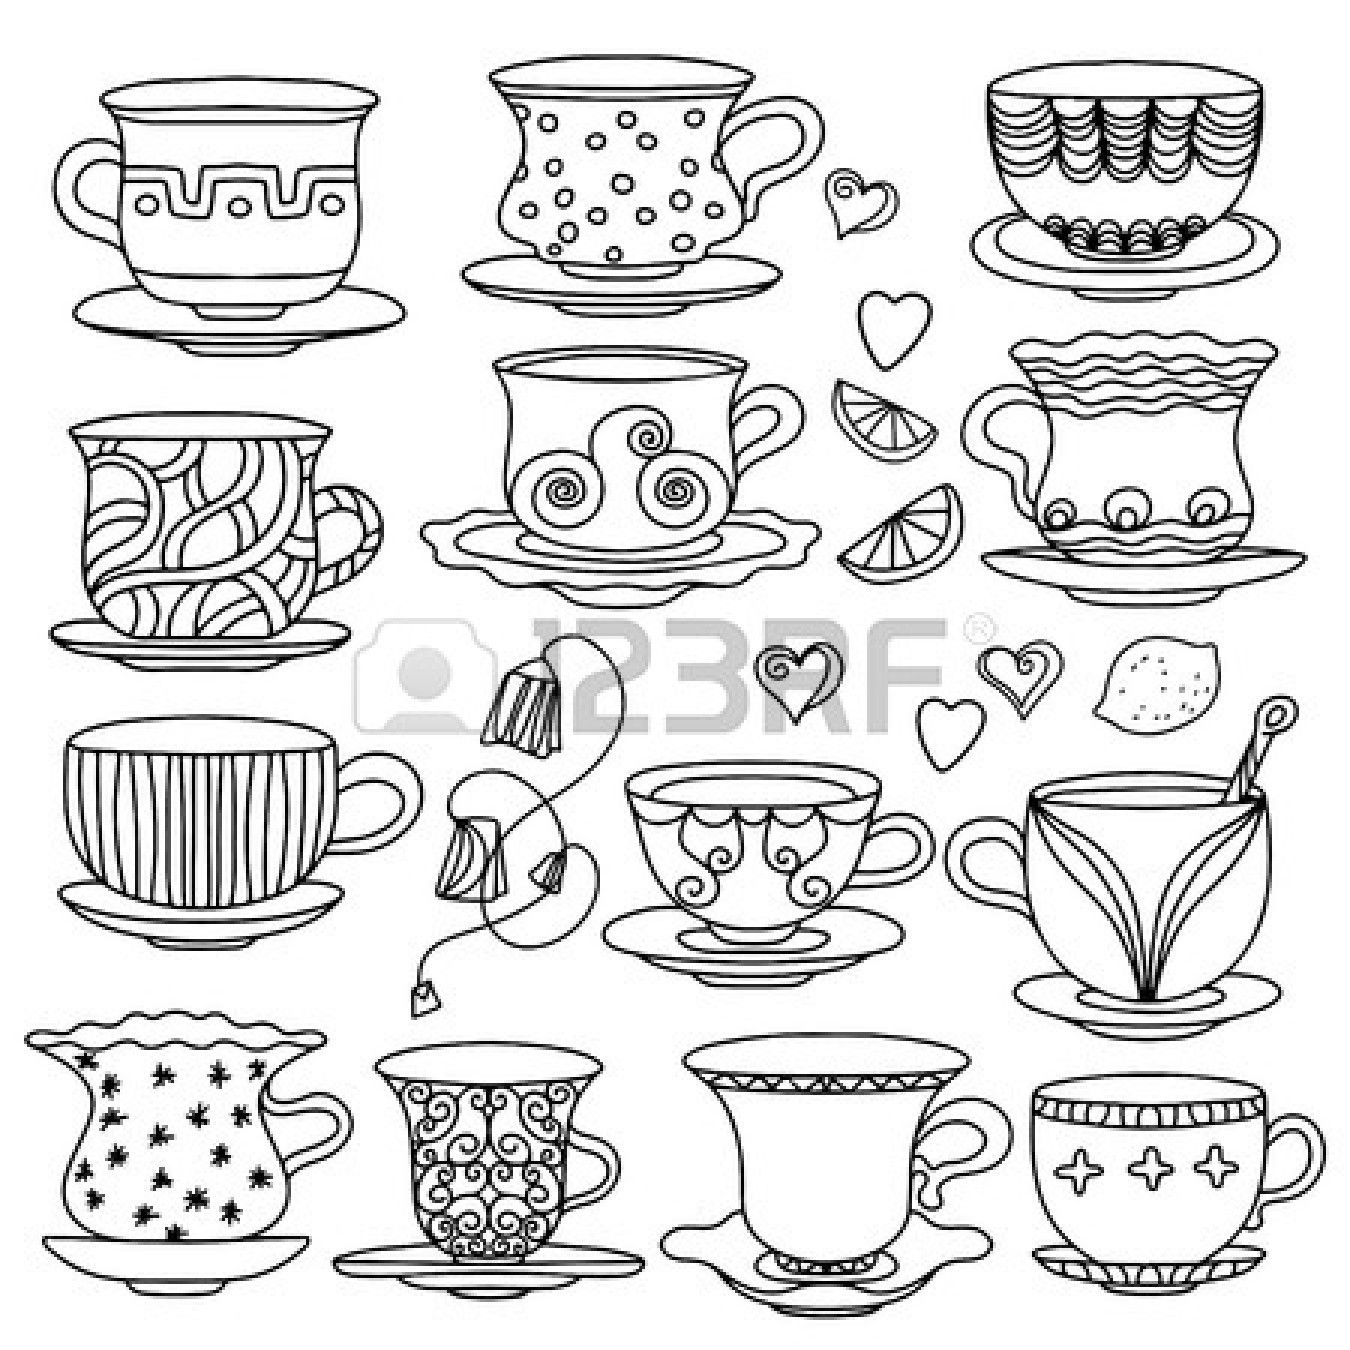 Teacup doodle ideas Tea cup drawing